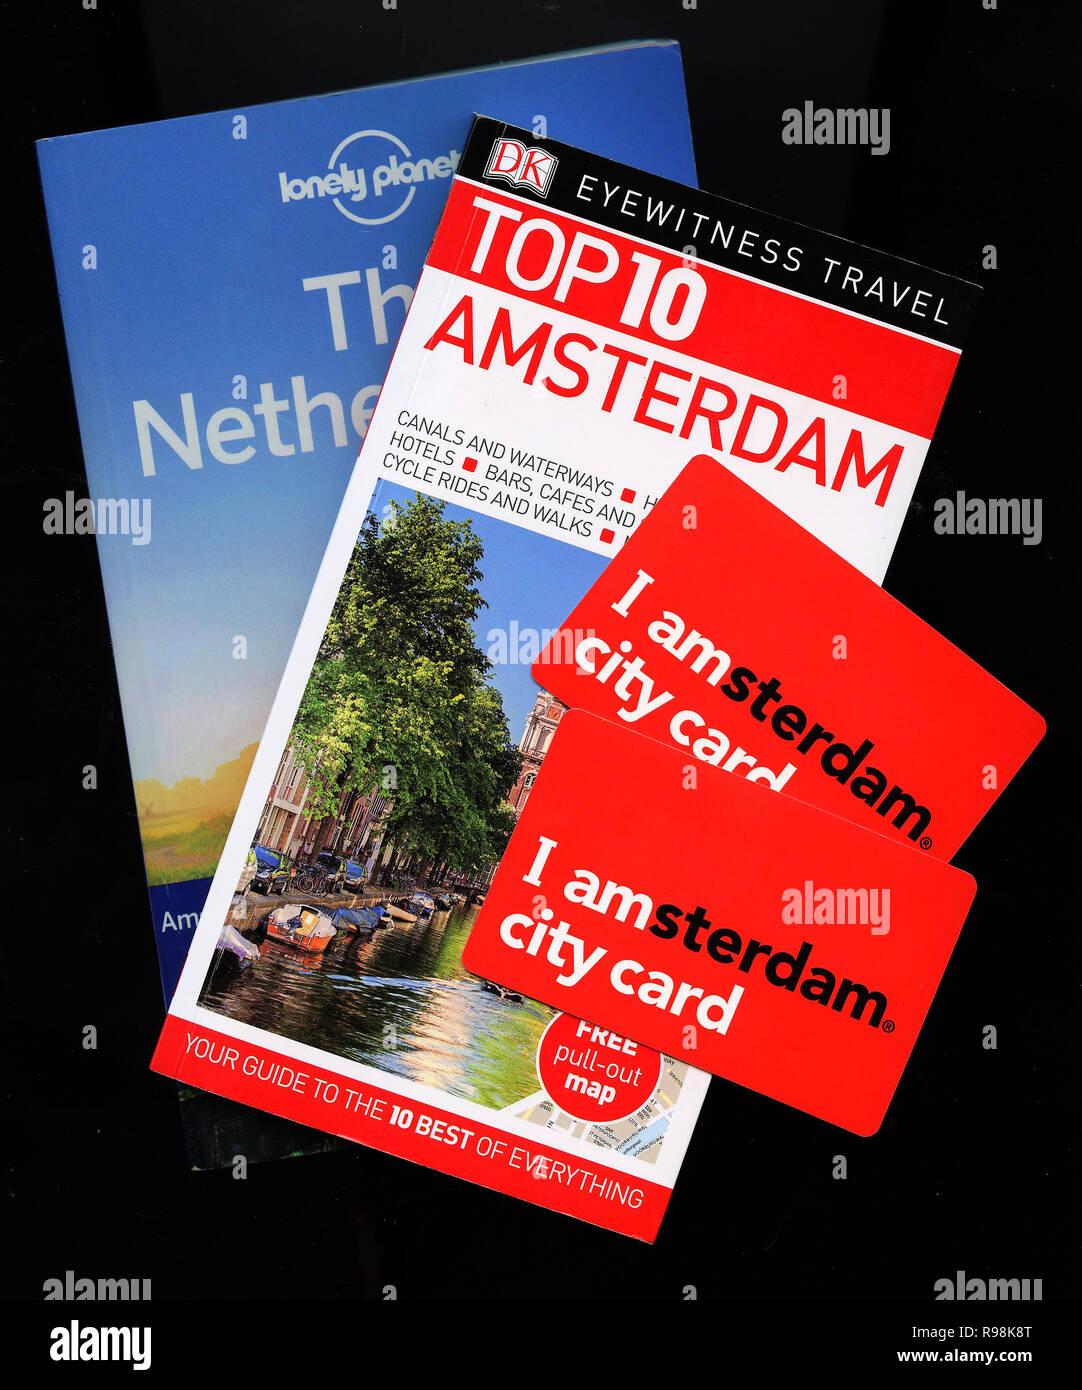 Lonely Planet, Eyewitness Travel Top 10 per Amsterdam, Olanda, Paesi Bassi insieme con i schede di amsterdam Immagini Stock